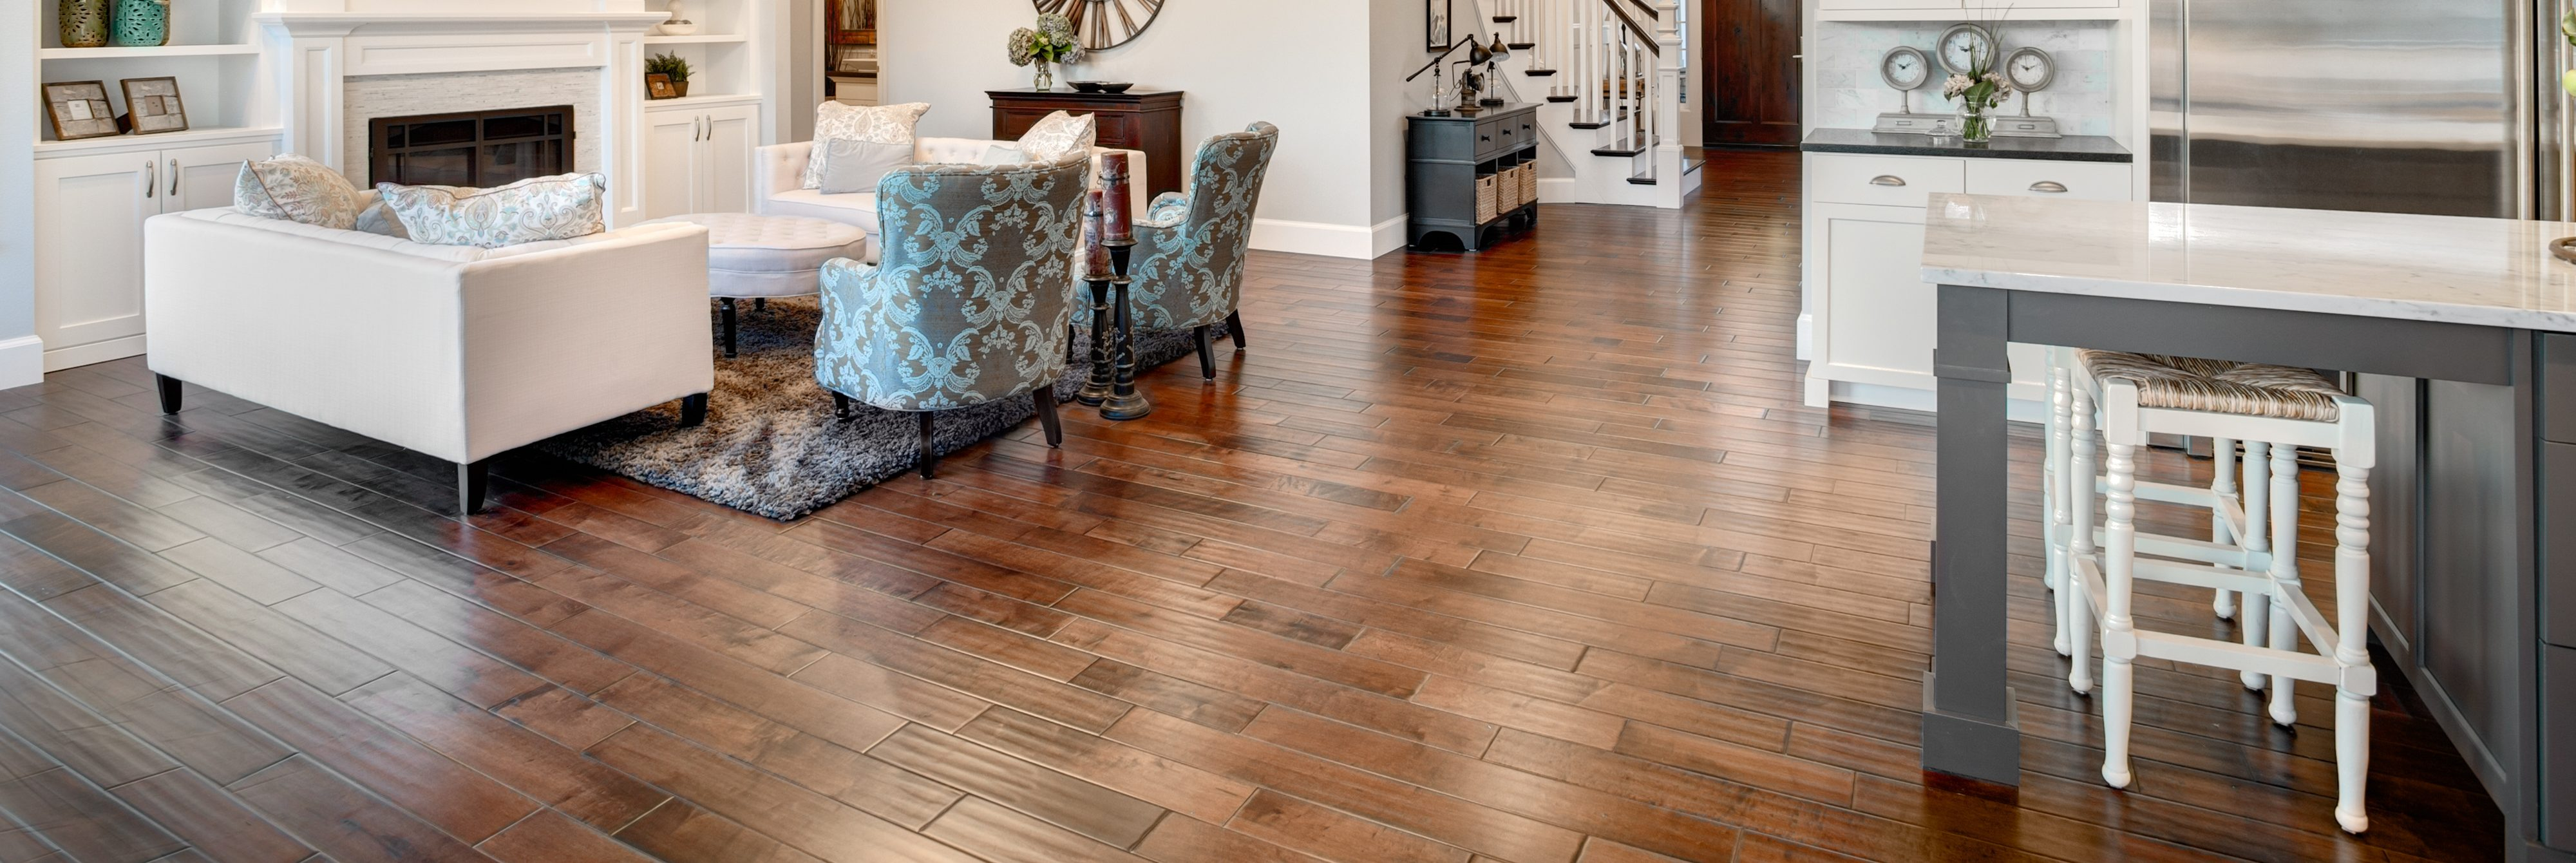 laminate flooring shea services us about floor tile mt wood kari